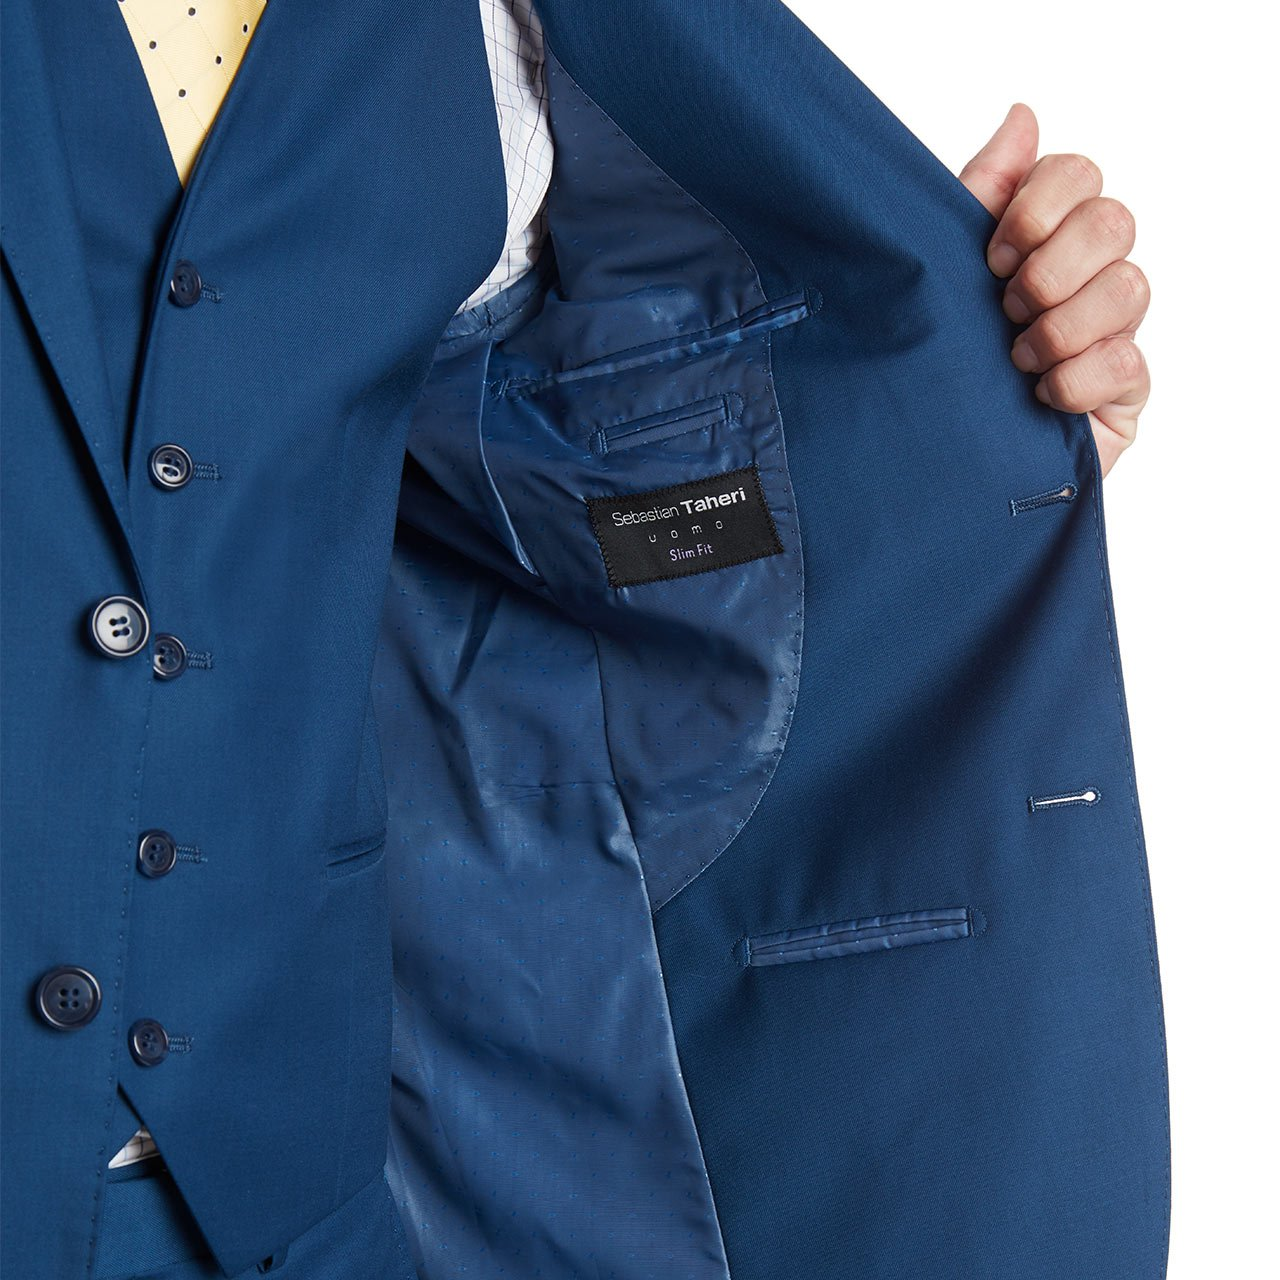 Mens Slim Fit Notched Lapel 3 Piece Suit Set Designed by Taheri French Blue 80/20(US 36R / EU 46R / Waist 30) by Sebastian Taheri Uomo (Image #5)